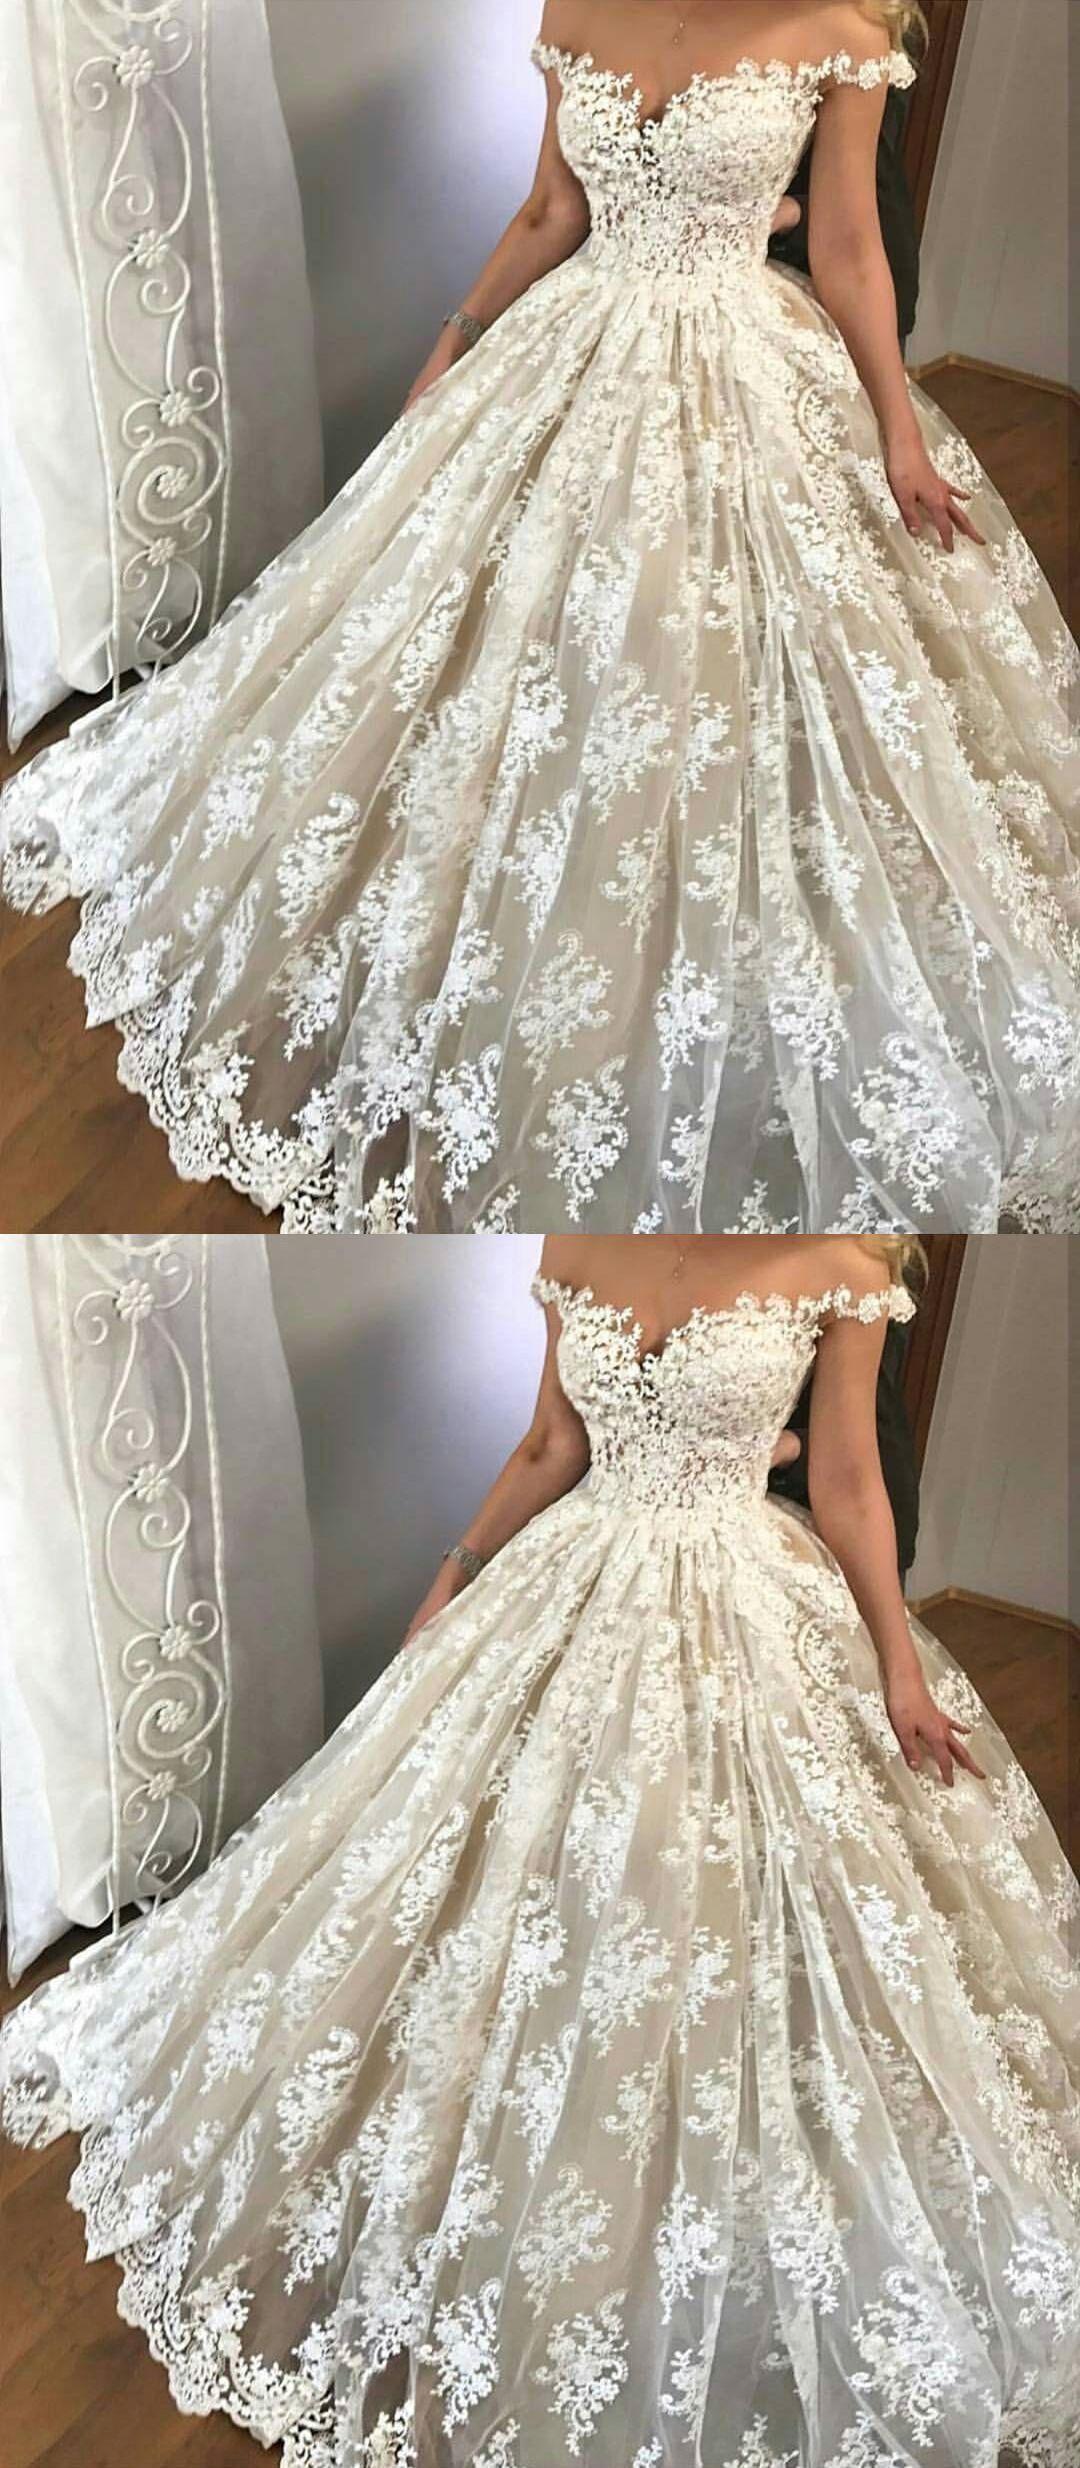 unique off the shoulder wedding dresses, glamorous wedding gowns